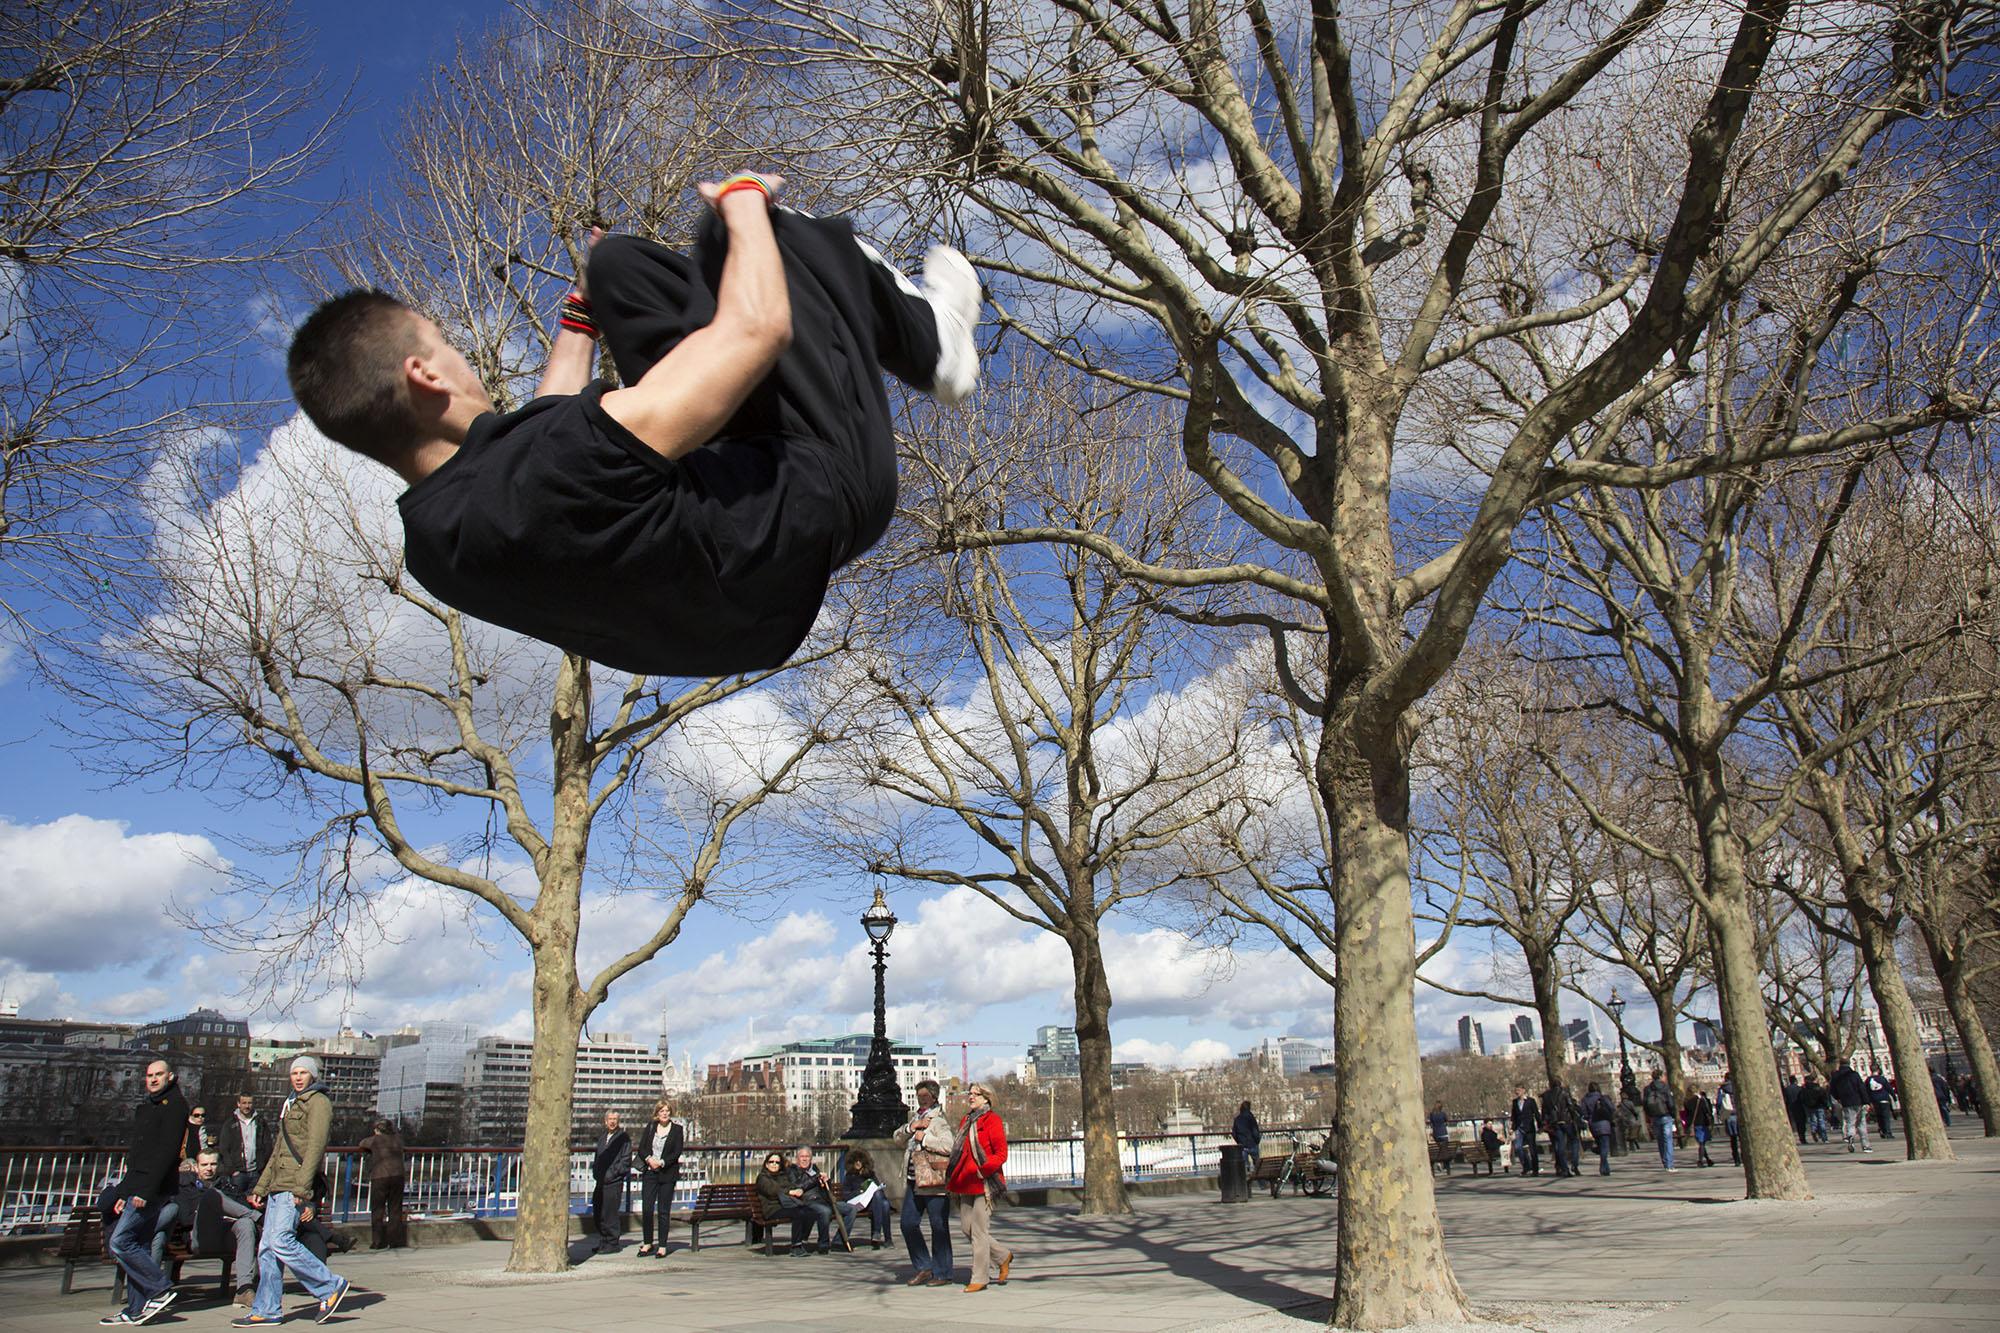 Parkour runner shows urban acrobatic skills.